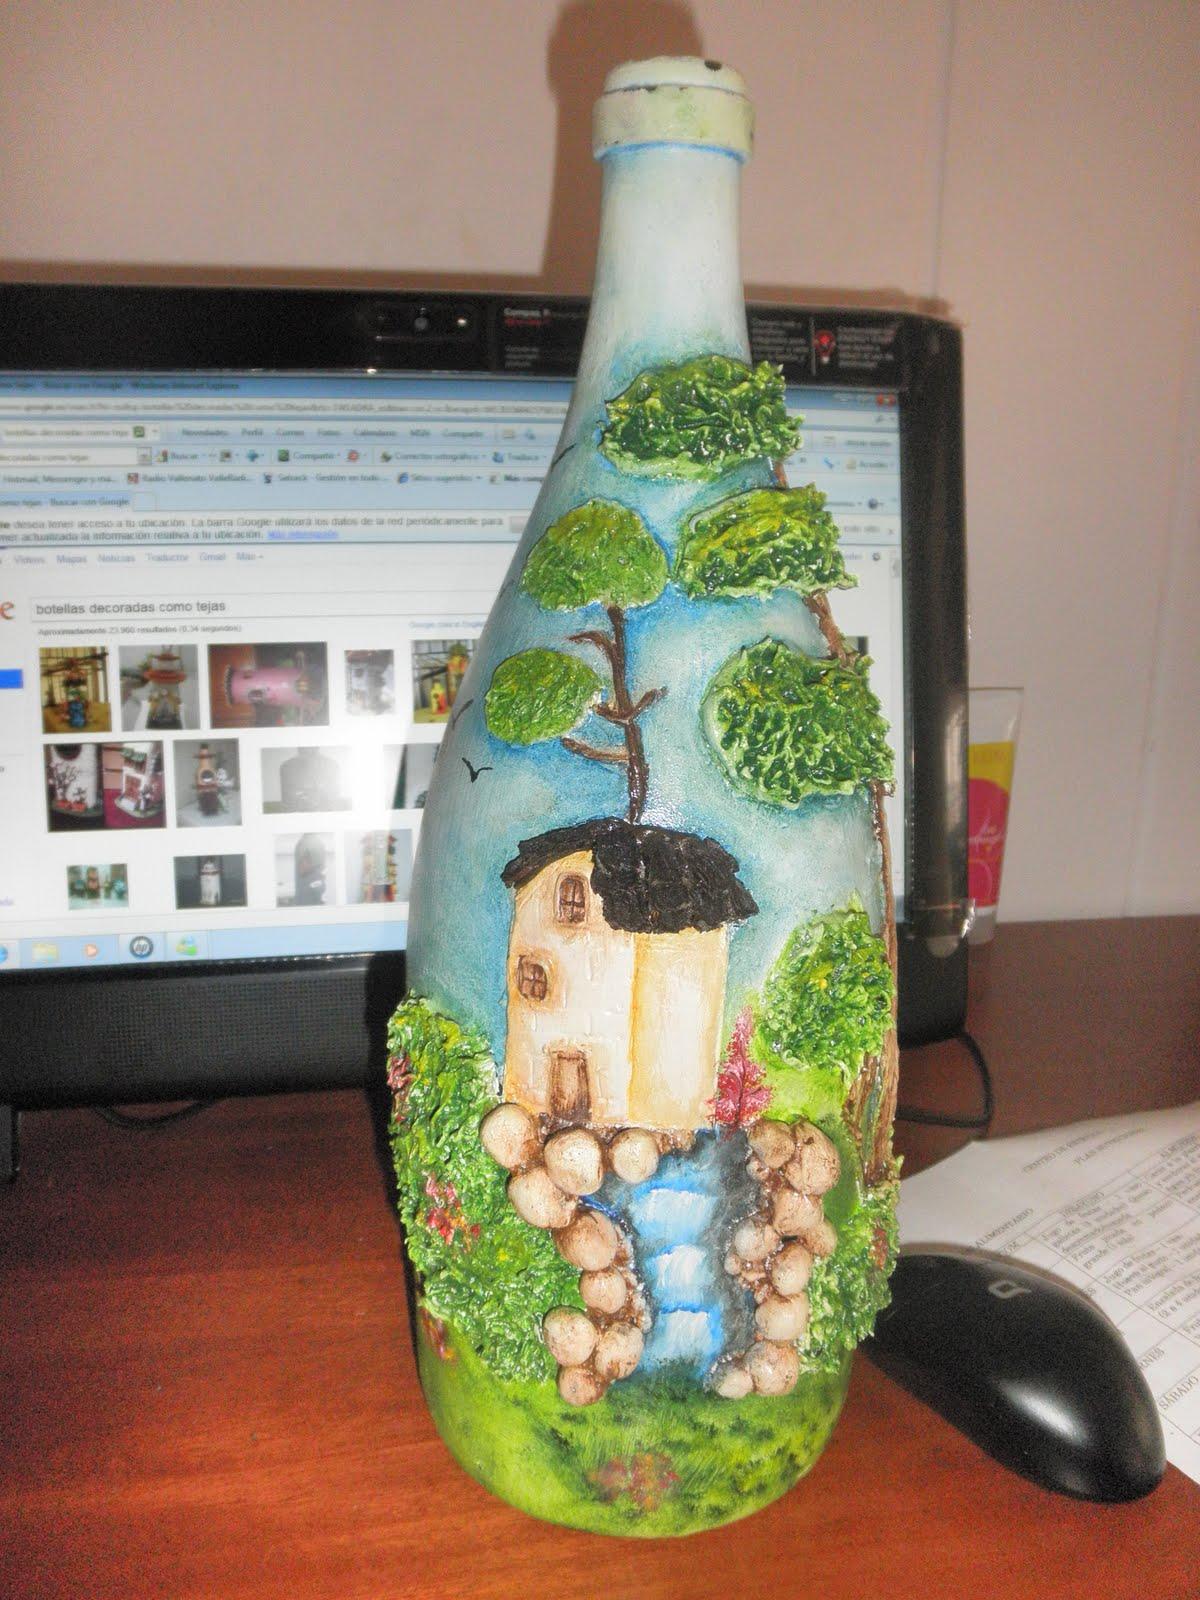 Mi peque o gran rinconcito botellas decoradas for Imagenes de estanques decorados